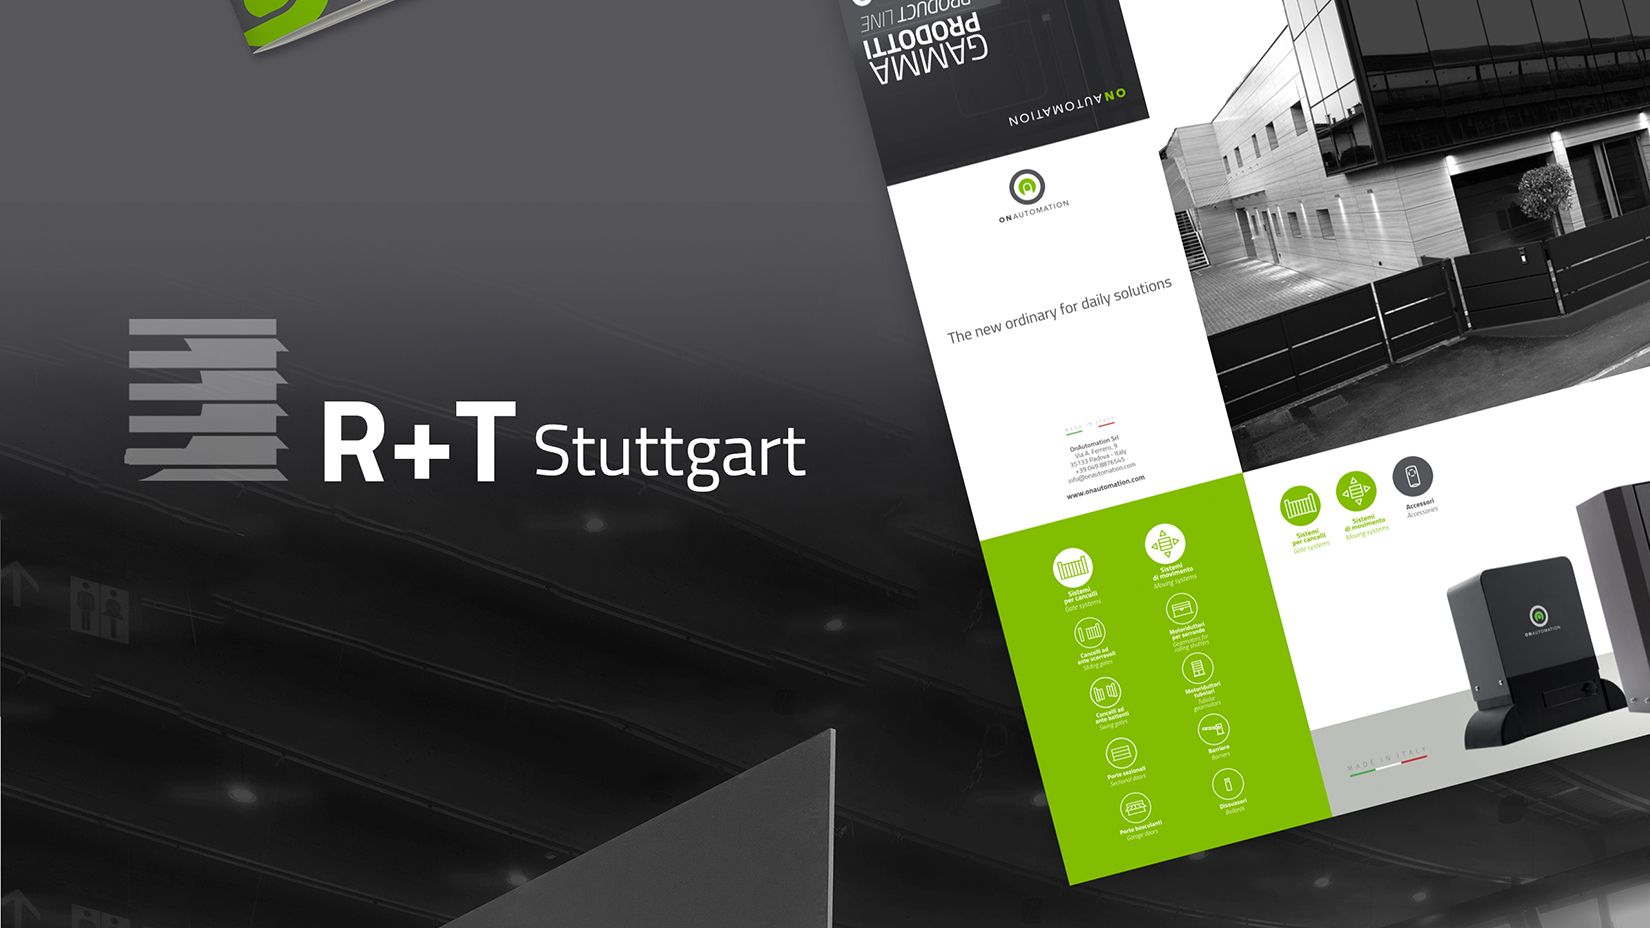 Allestimenti Fieristici Design Stand R+T 2018 OnAutomation 06